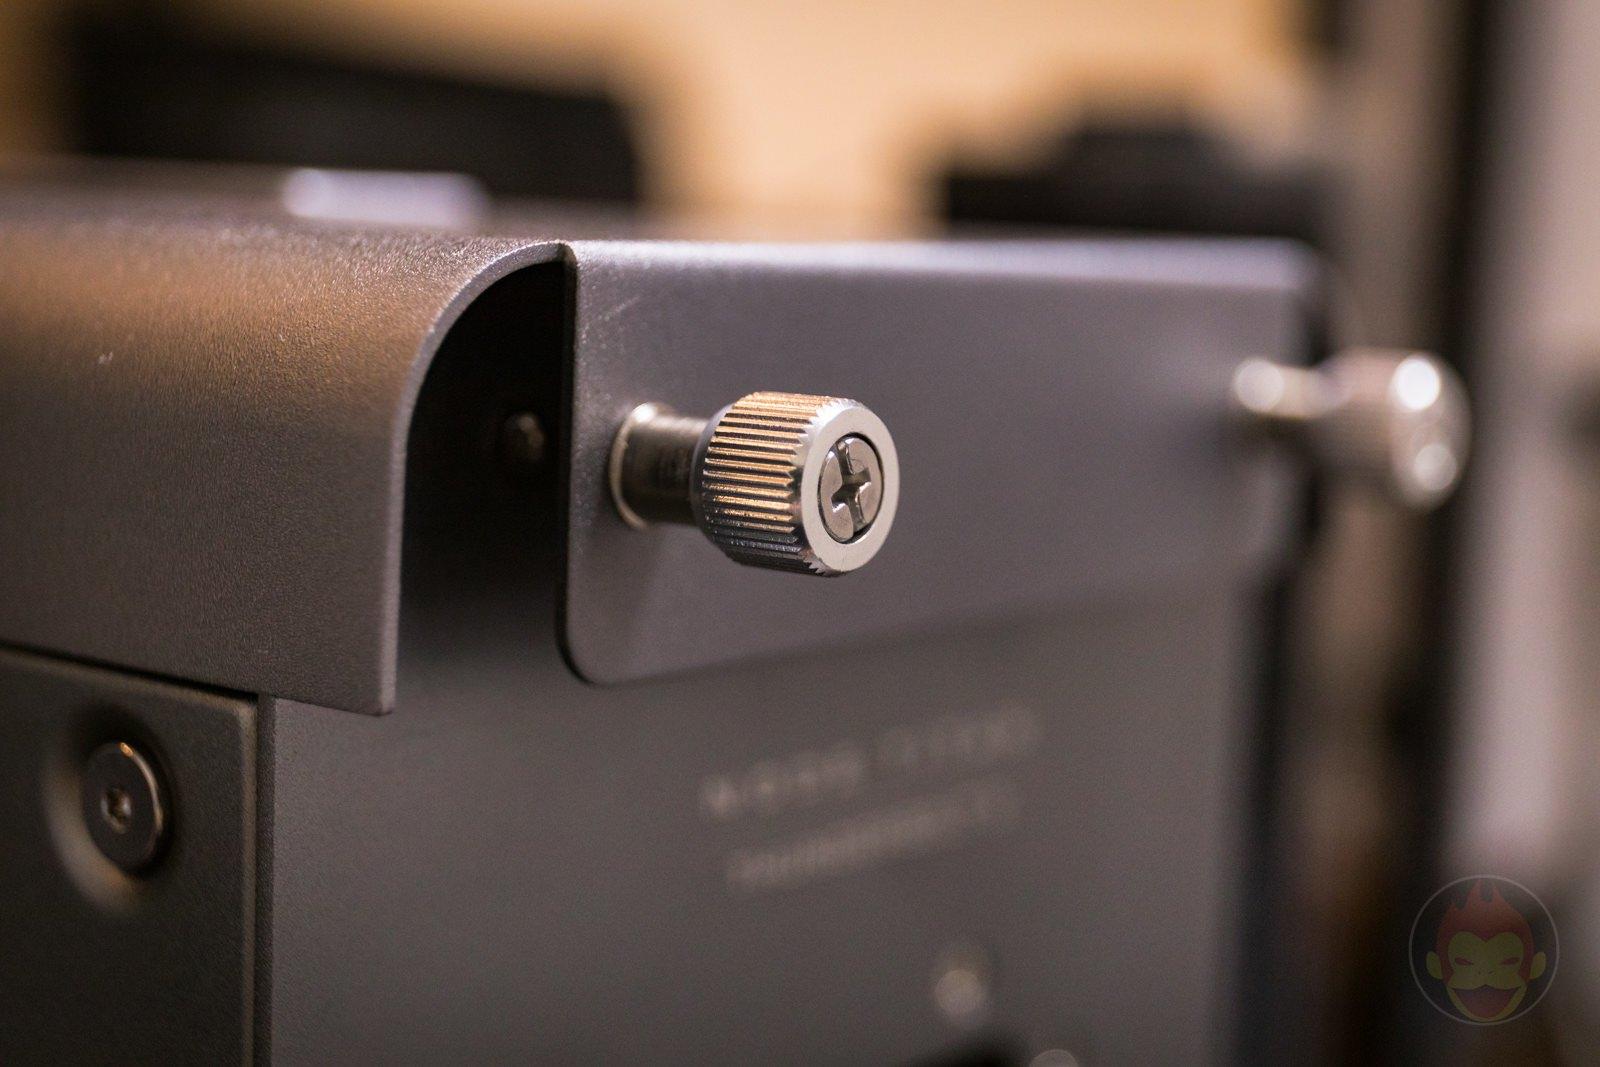 AKiTiO Node Titan with msi AMD Radeon RX 5700 XT Review 09